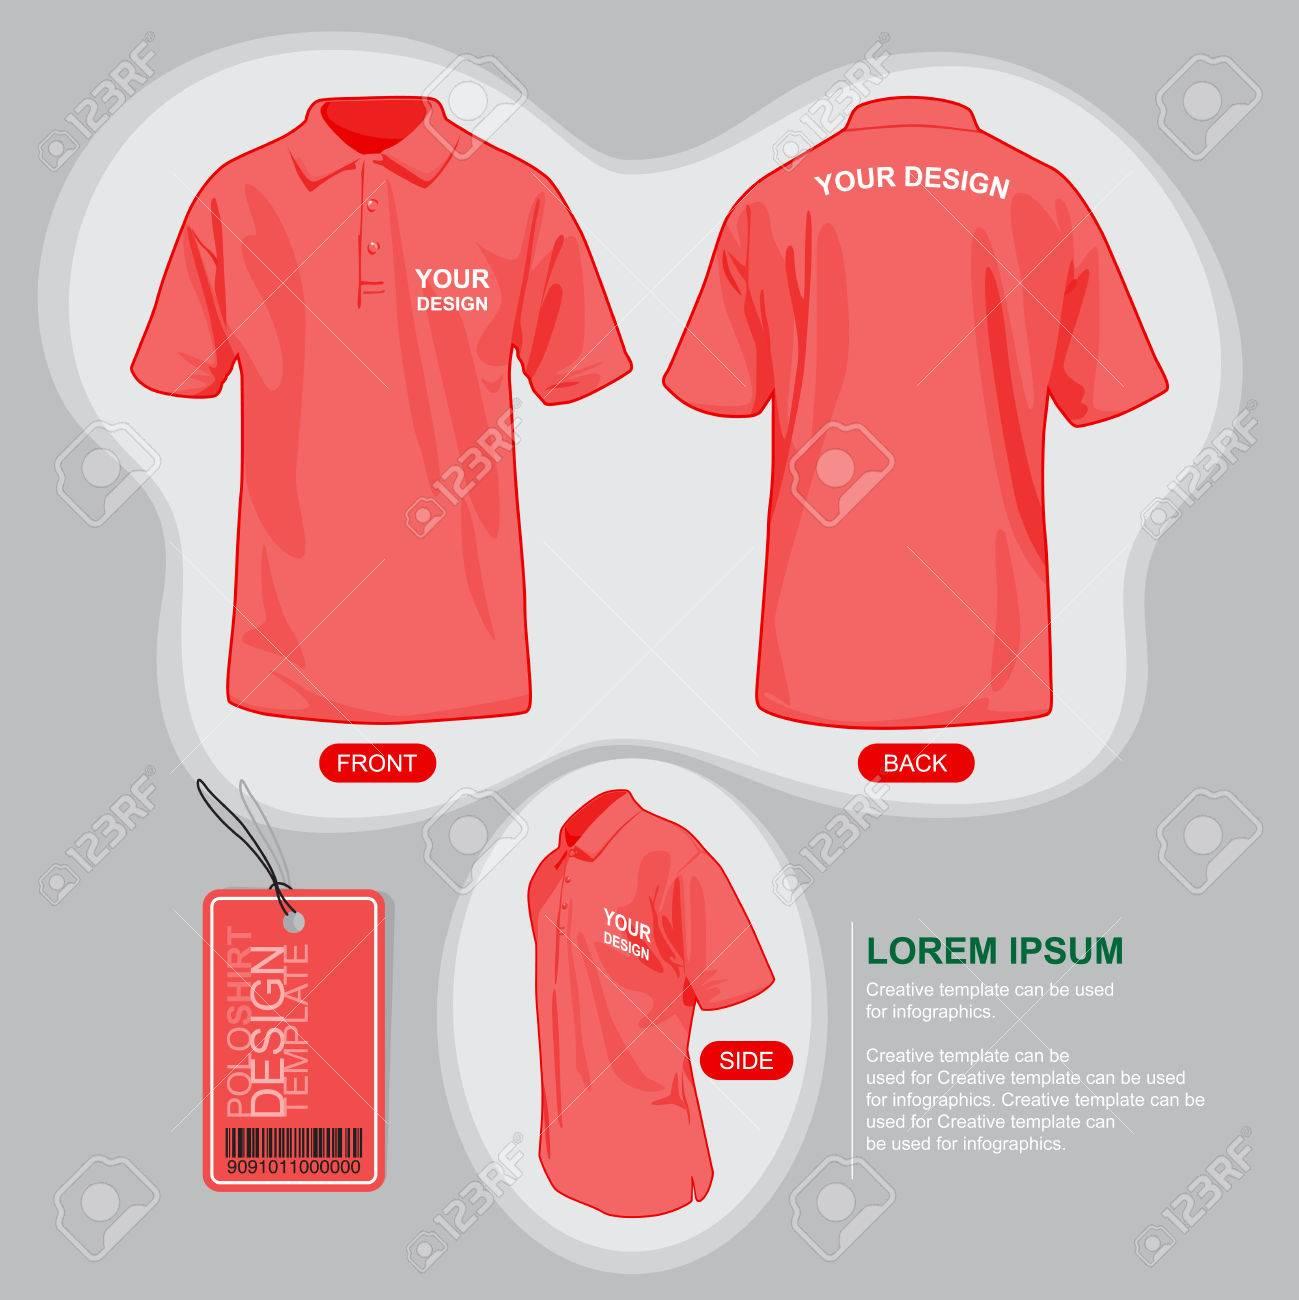 Shirt uniform design vector - Polo Shirt Uniform Template Illustration By Vector Design Stock Vector 49303571